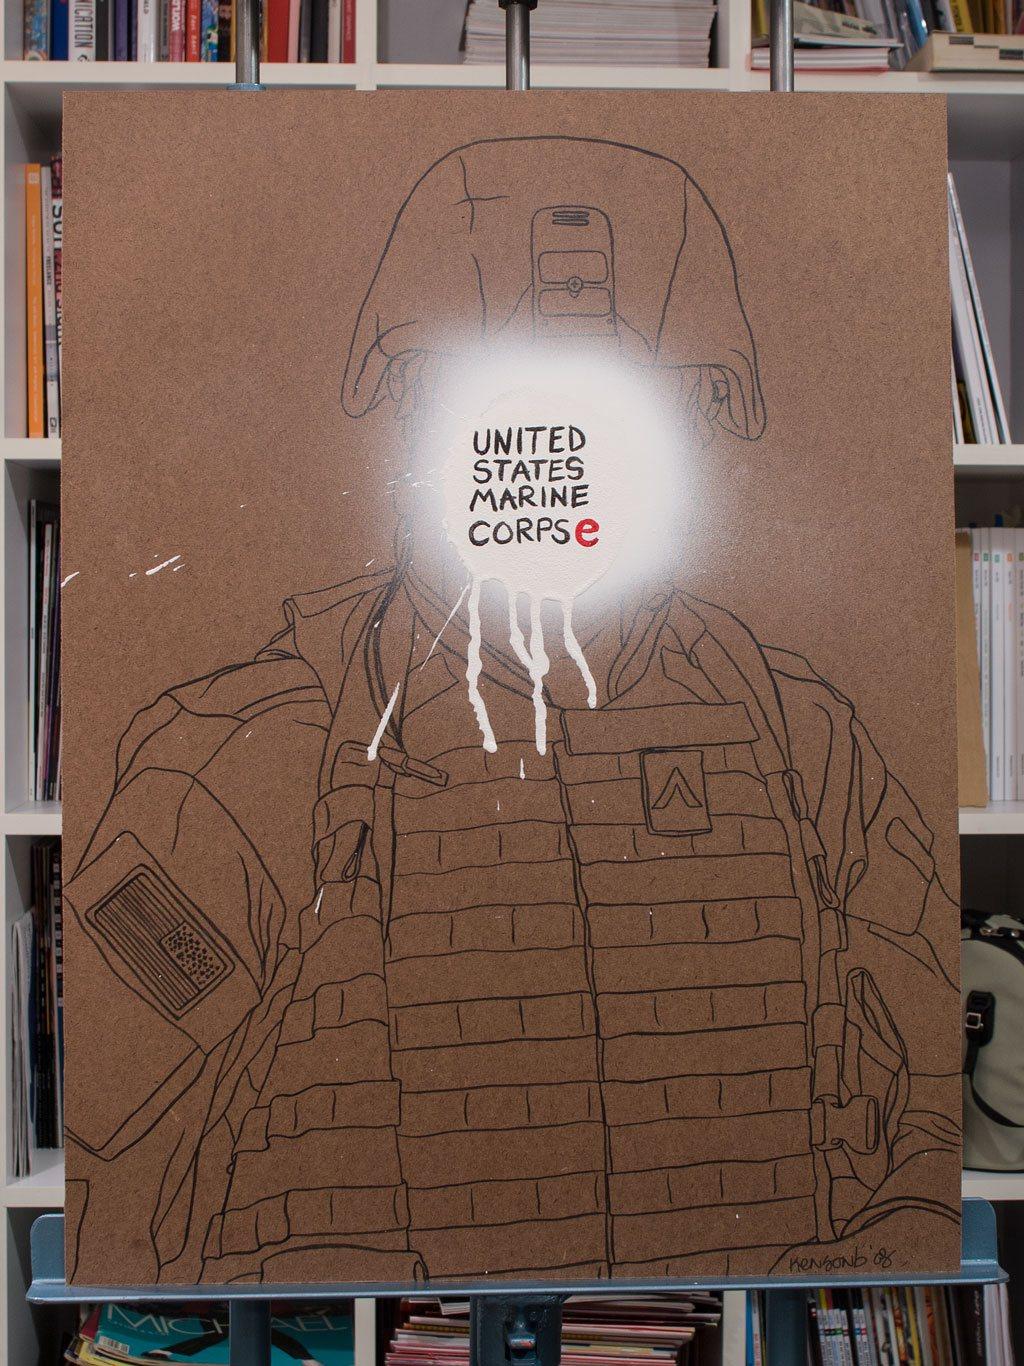 United States Marine Corpse